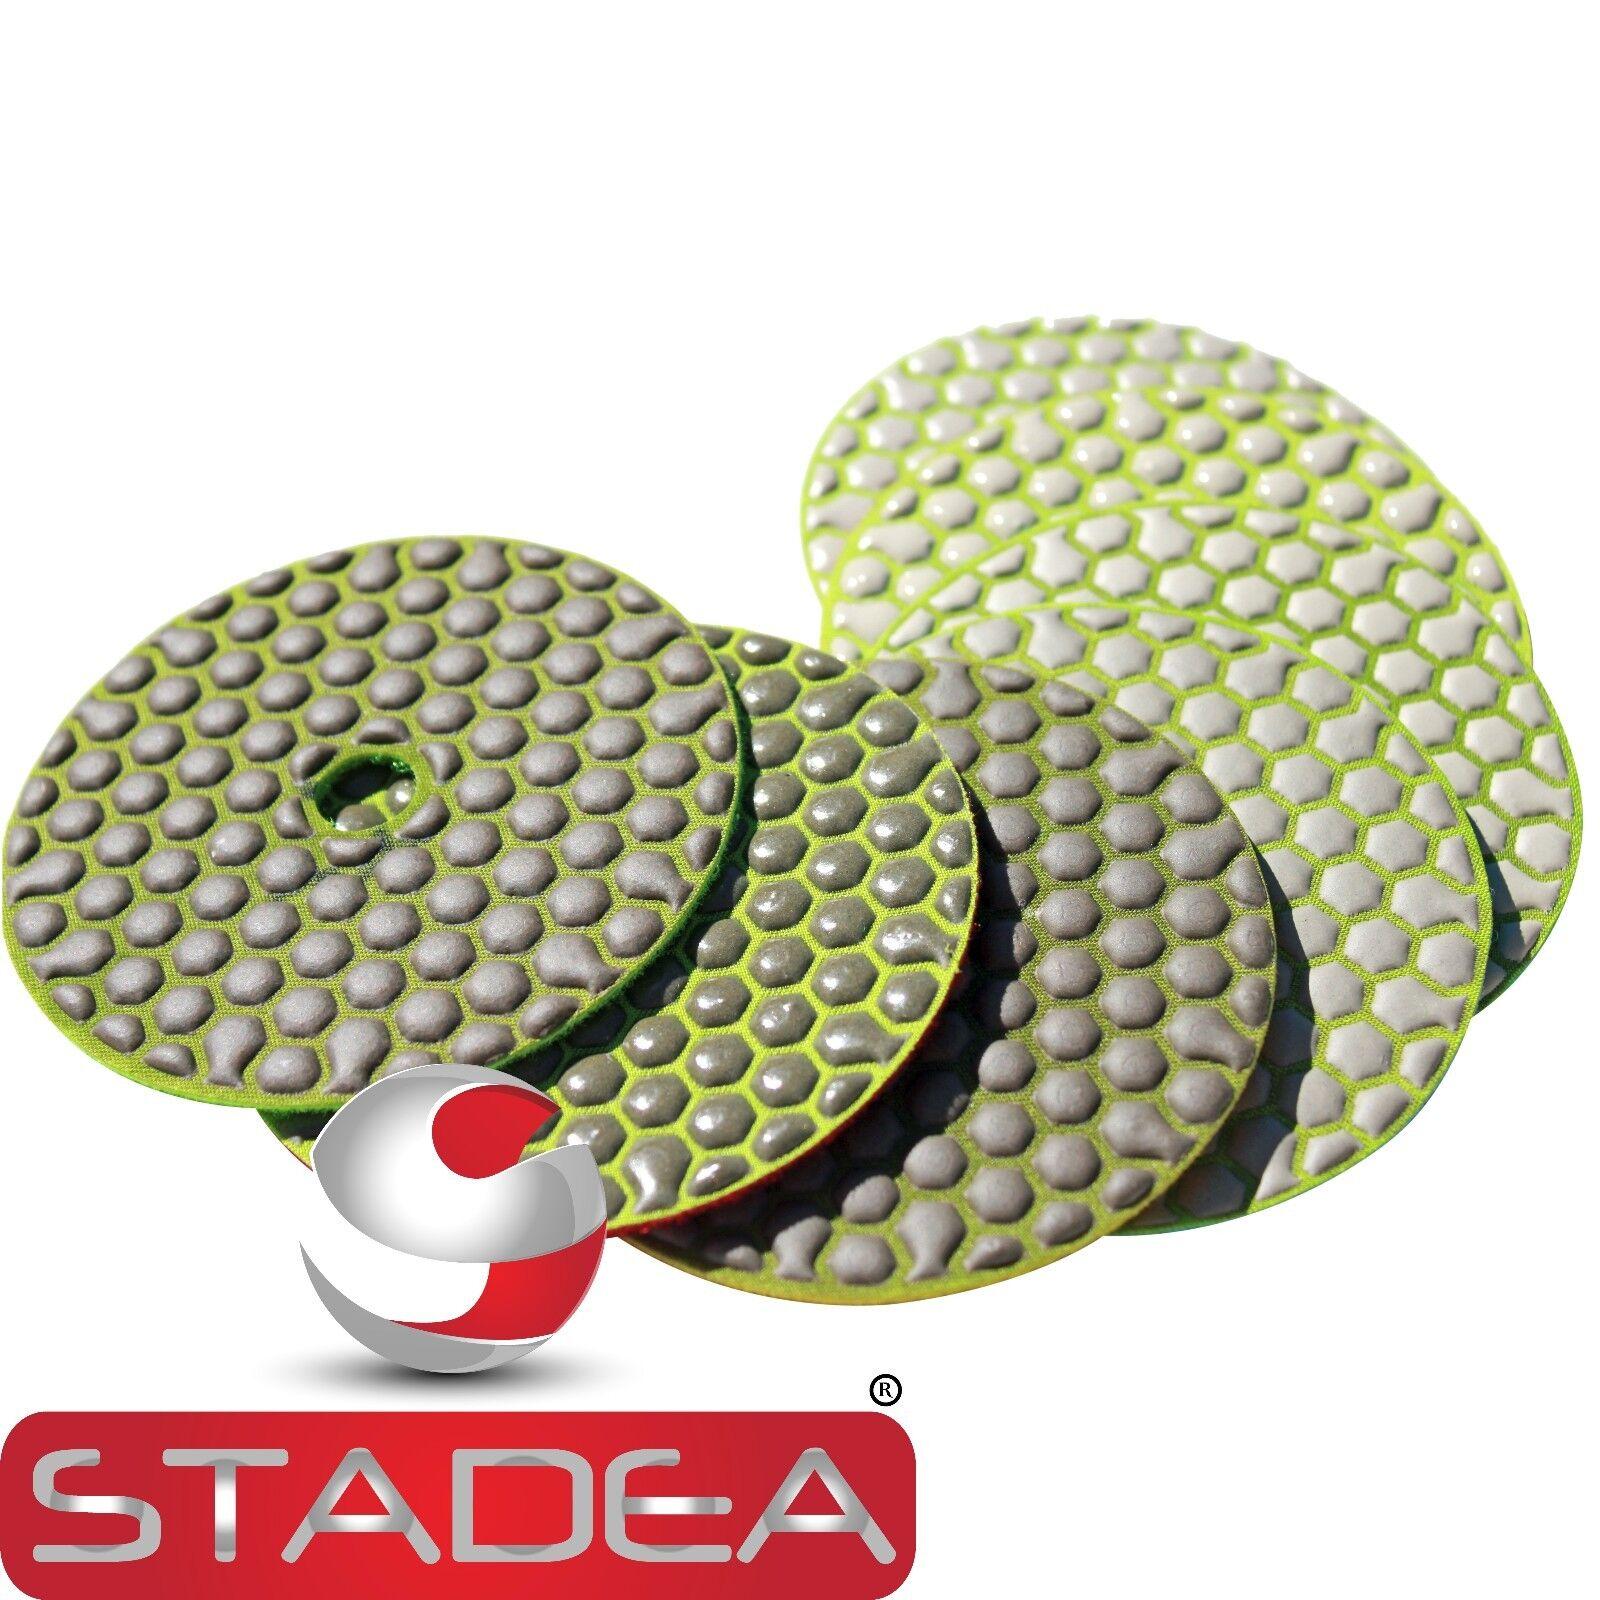 Stadea 4 Quot Diamond Dry Concrete Stone Marble Granite